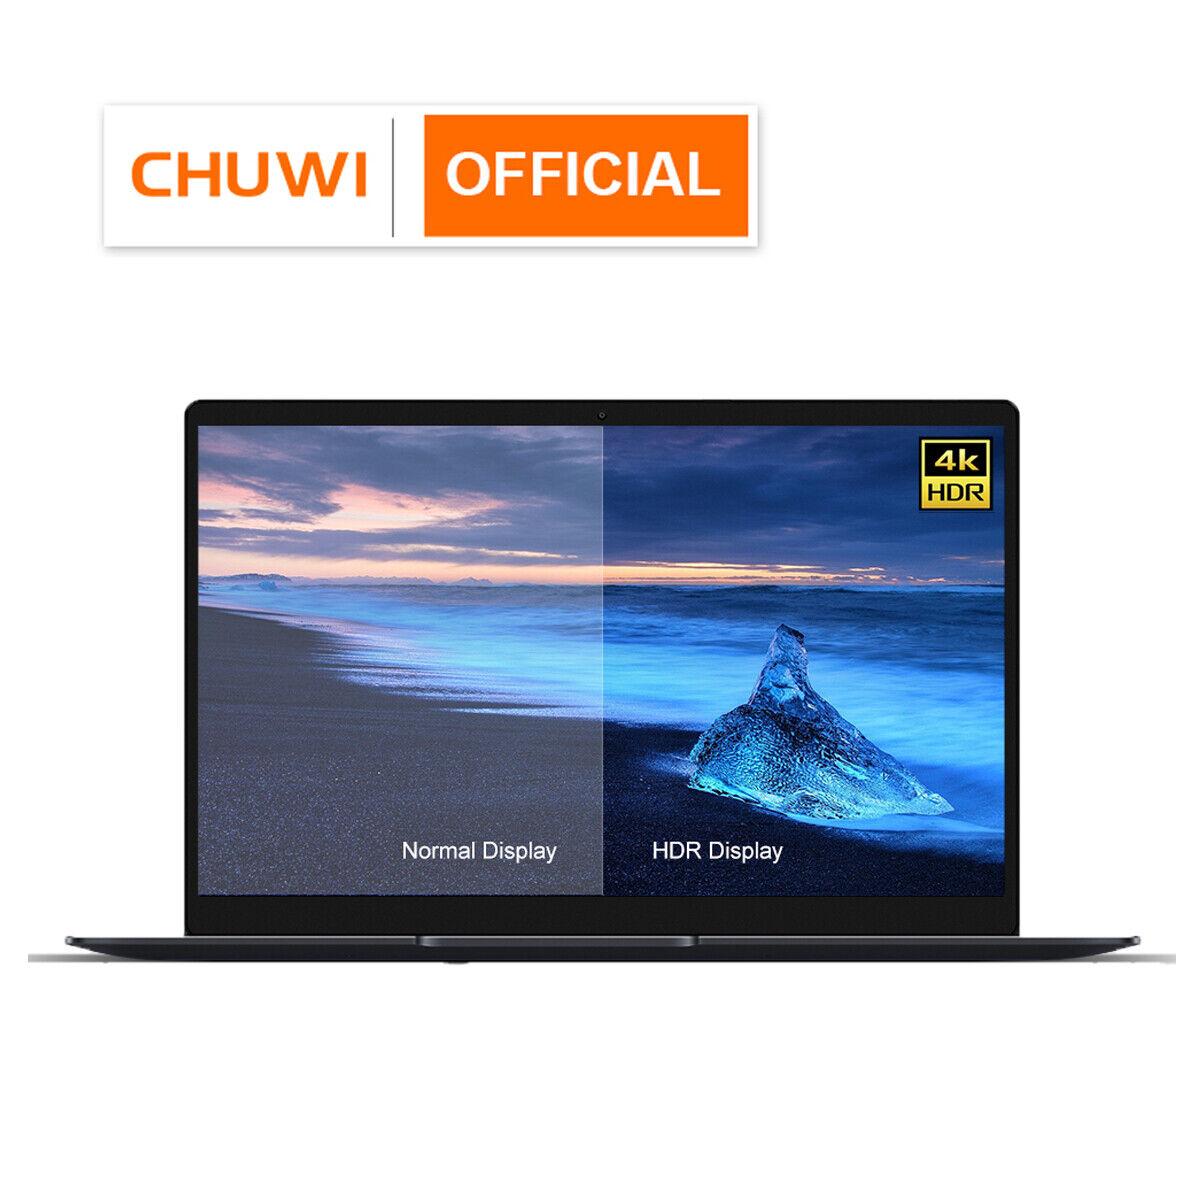 CHUWI HeroBook AeroBook LapBook Pro/Plus Boardless/Backlit 2